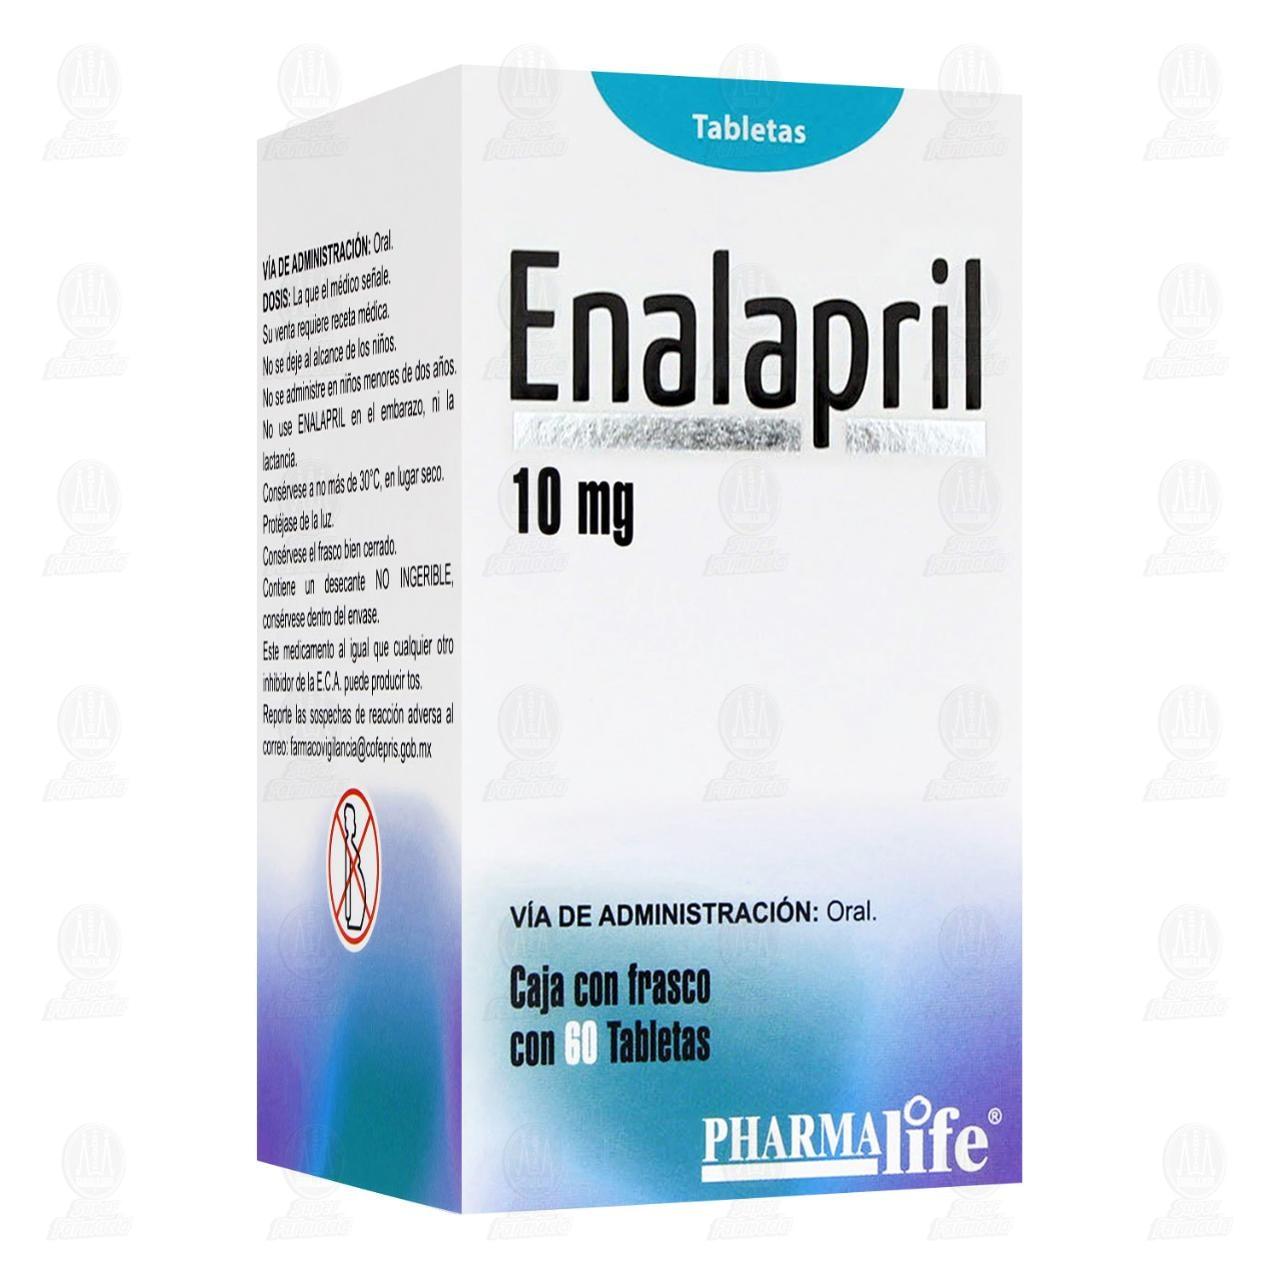 Enalapril 10mg 60 Tabletas Frasco Pharmalife